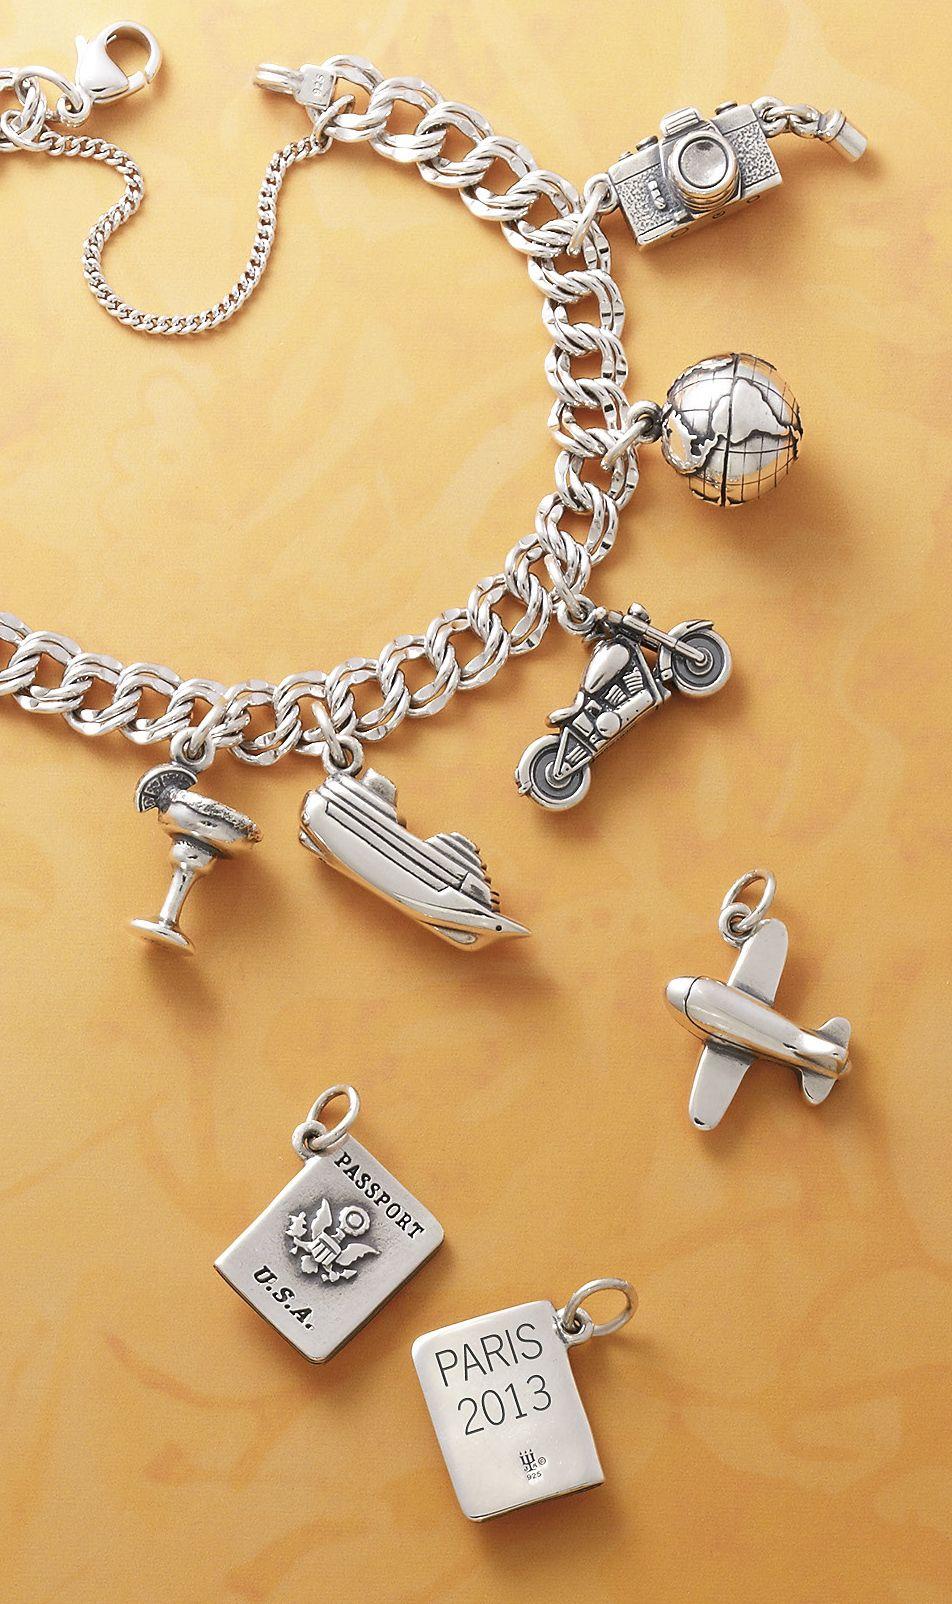 Pandora bracelet dillards - Travel Charms From James Avery Charms